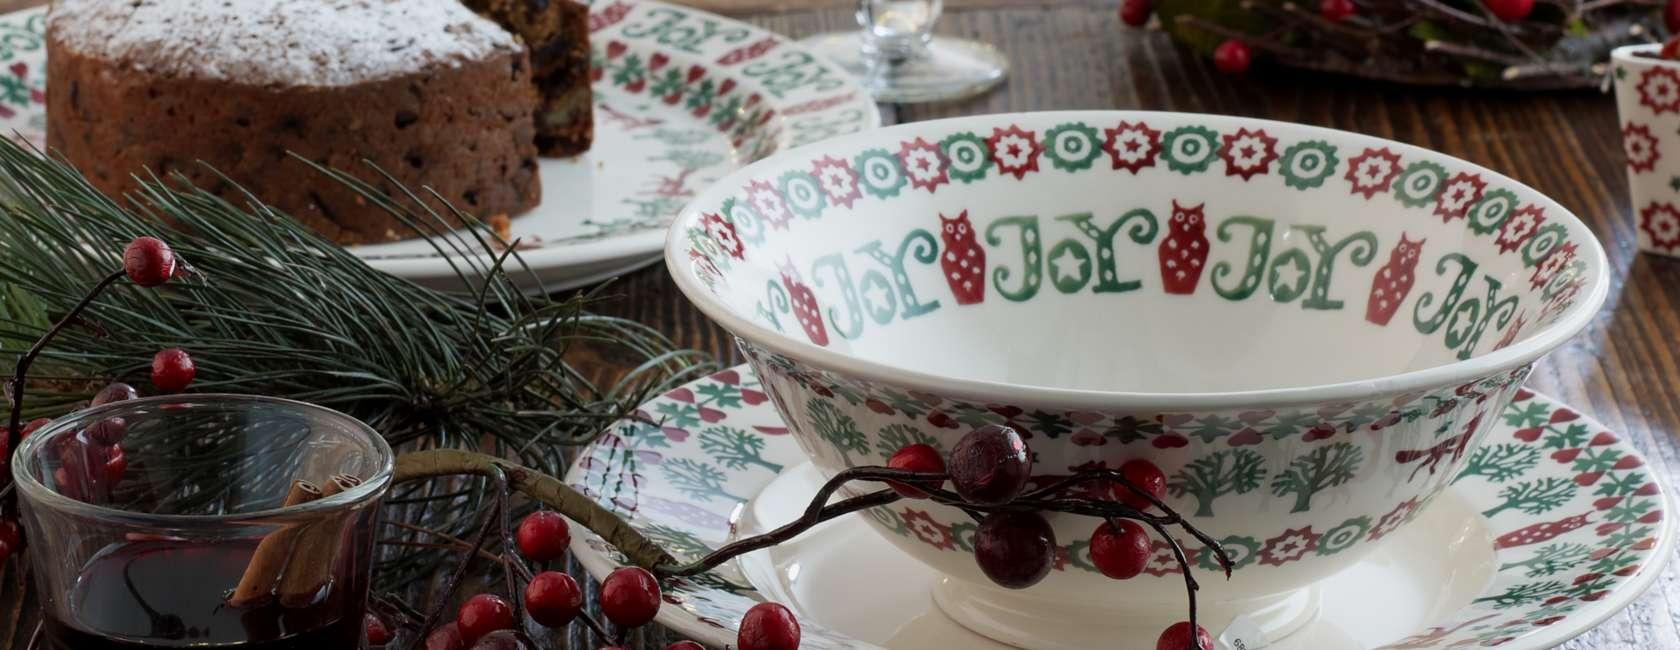 Regali di Natale: pottery e mug firmate Emma Bridgewater